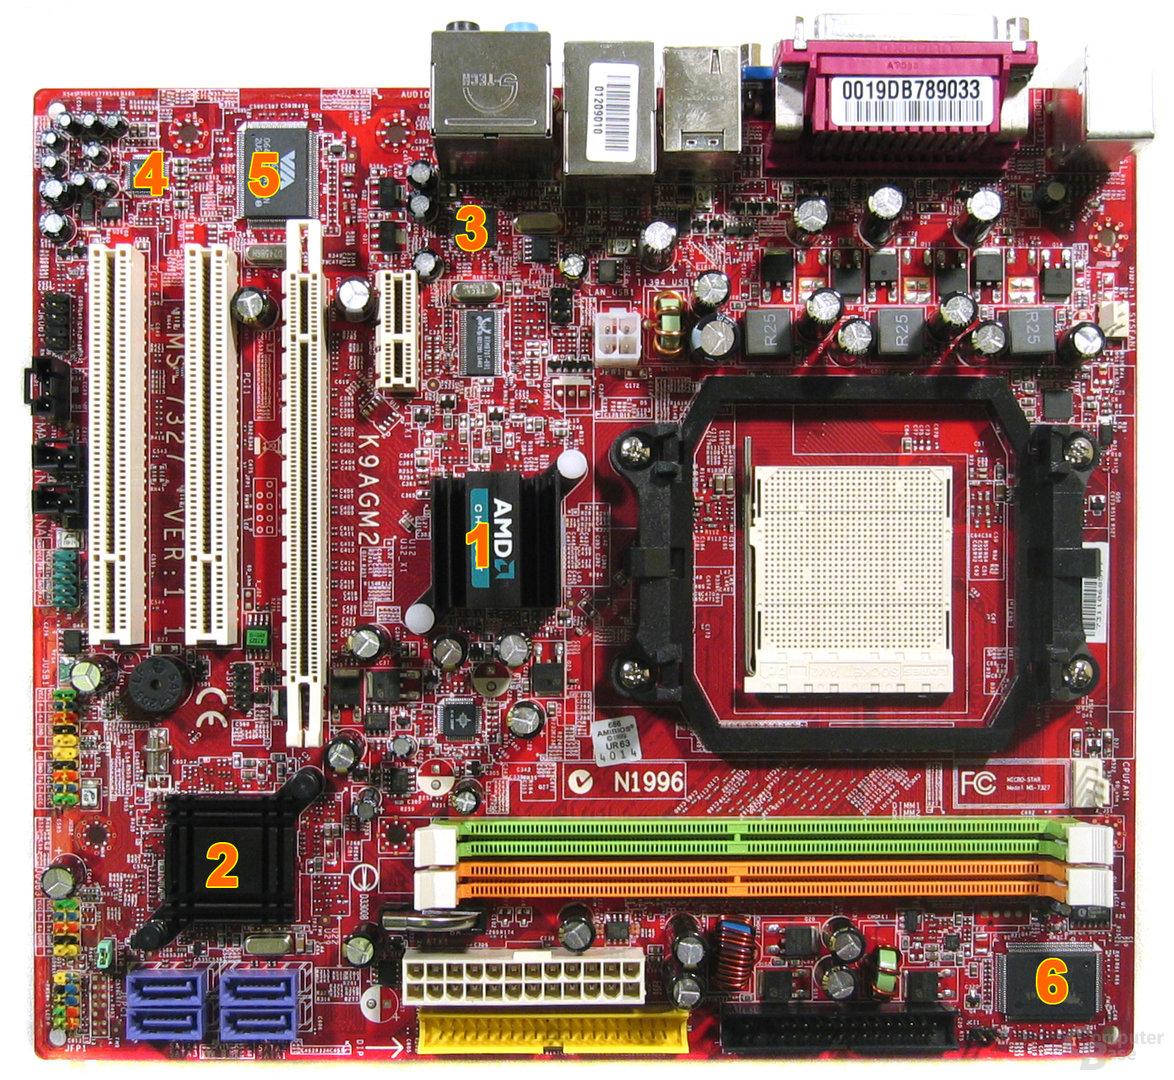 MSI K9AGM2 - Komponenten